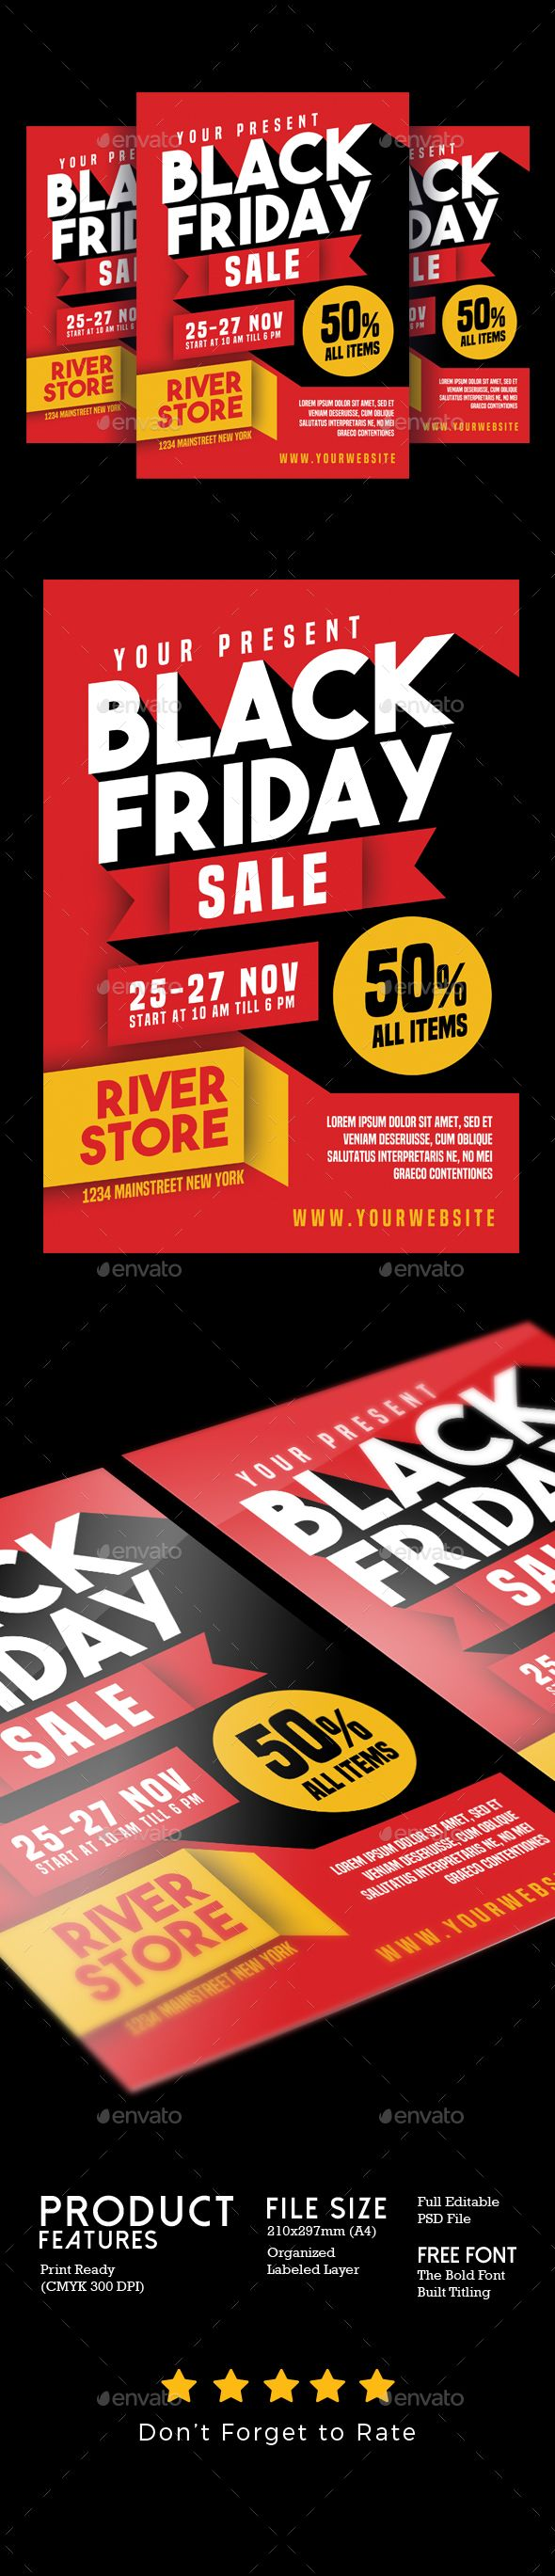 #Black #Friday Sale #Flyer - Flyers #Print #Templates Download here: https://graphicriver.net/item/black-friday-sale-flyer/18575747?ref=alena994